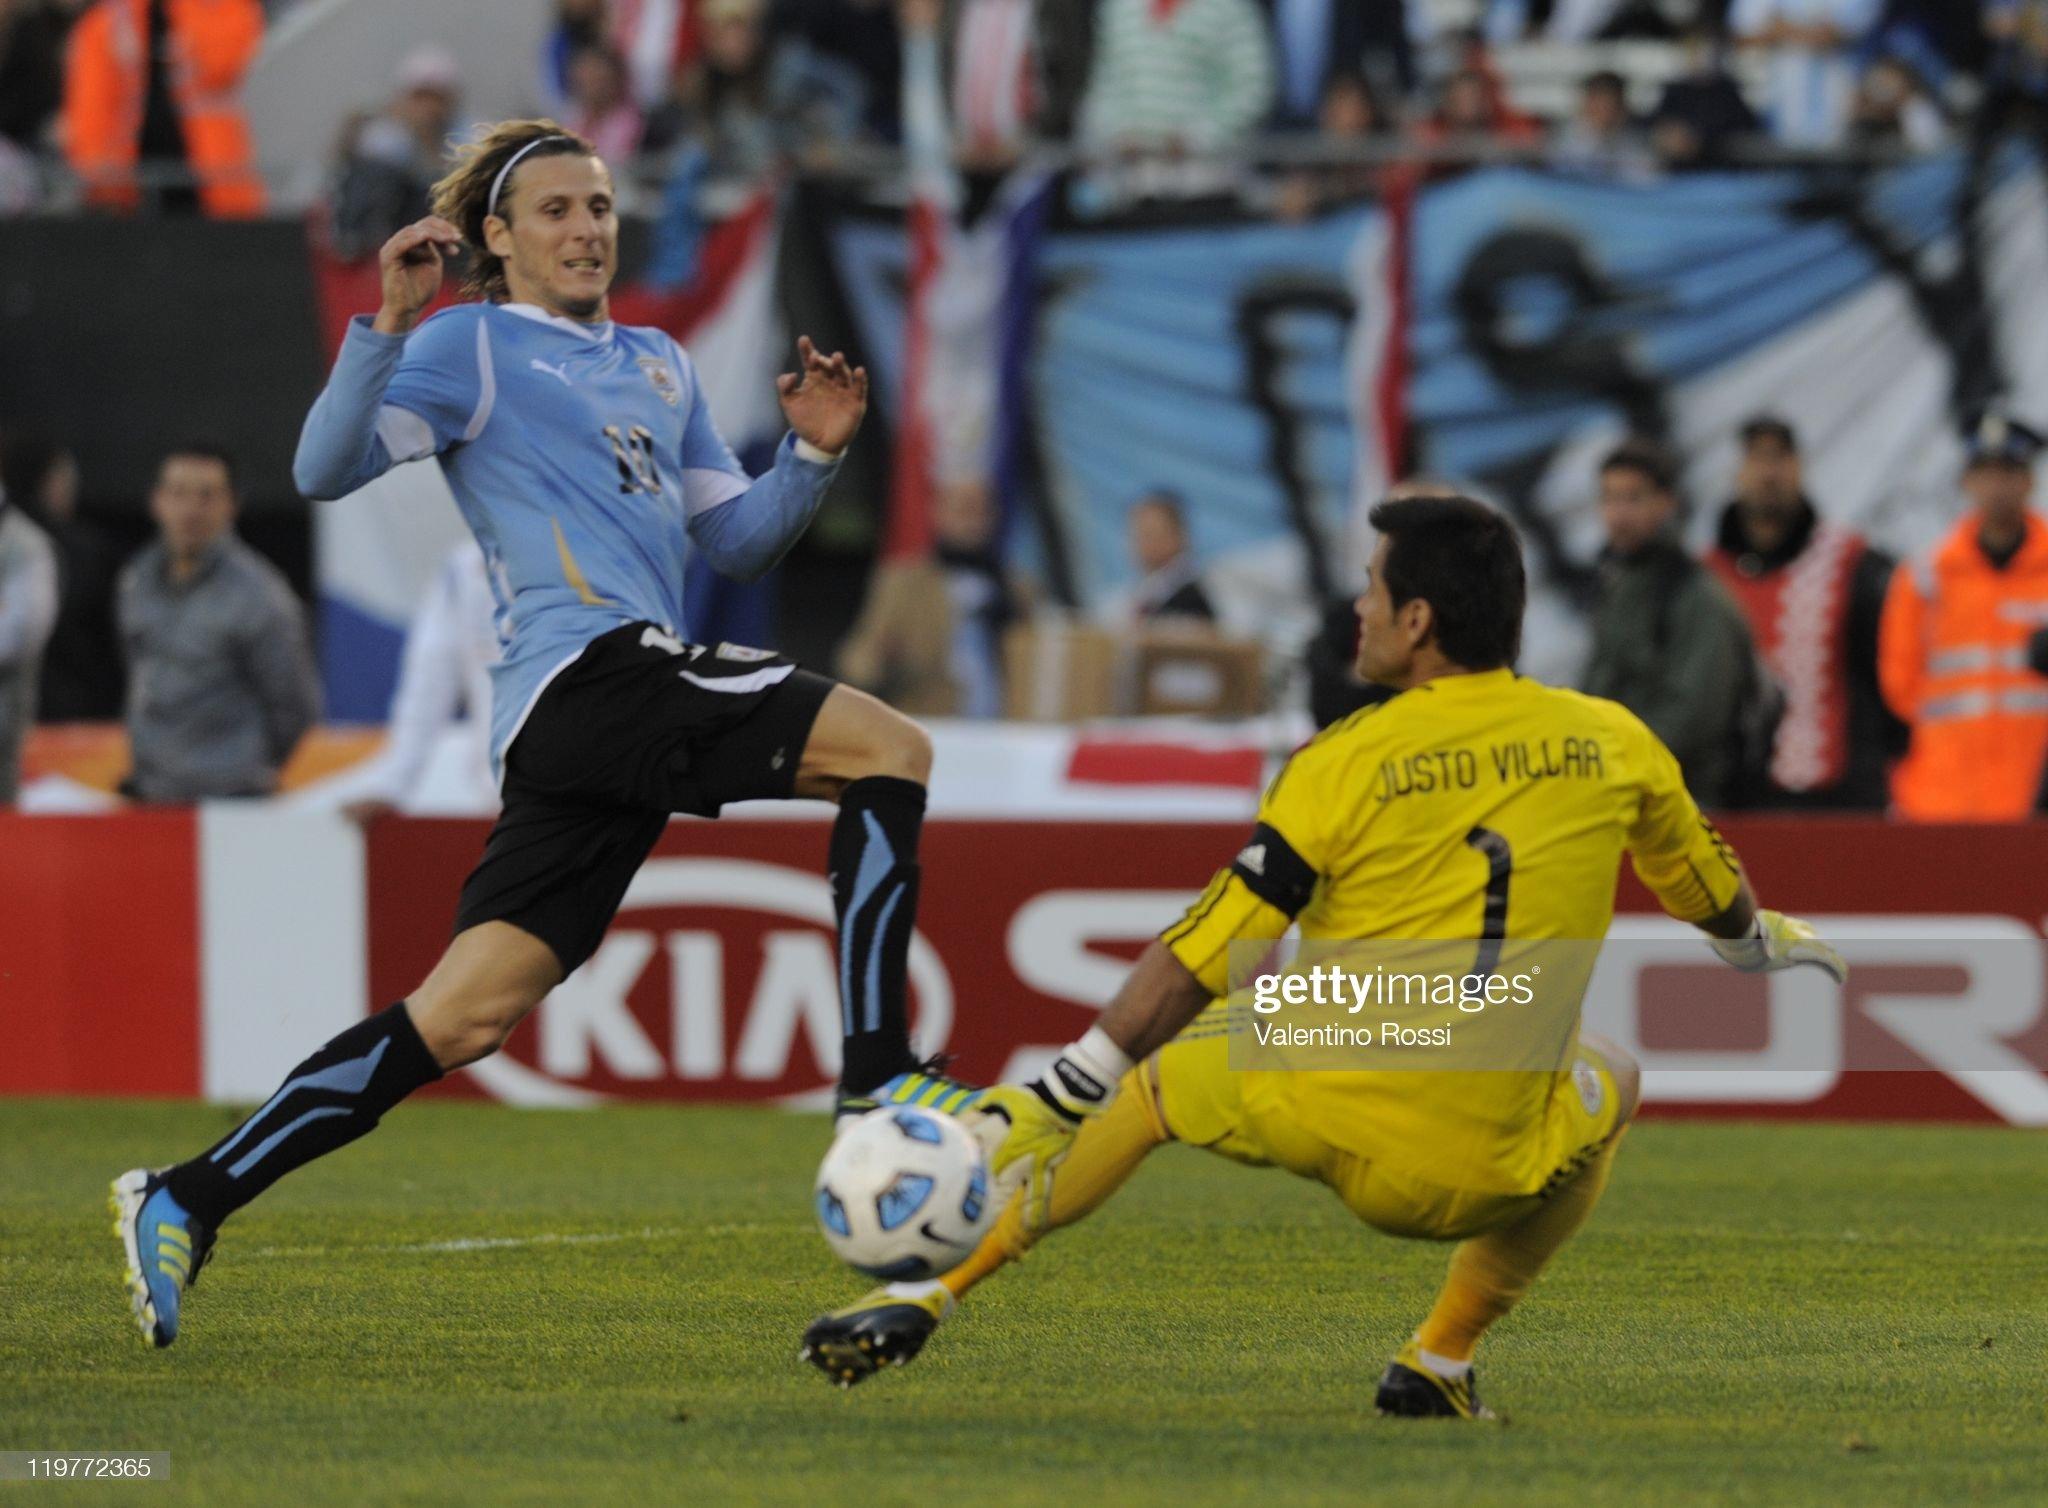 Uruguay v Paraguay - Copa America 2011 Final : News Photo